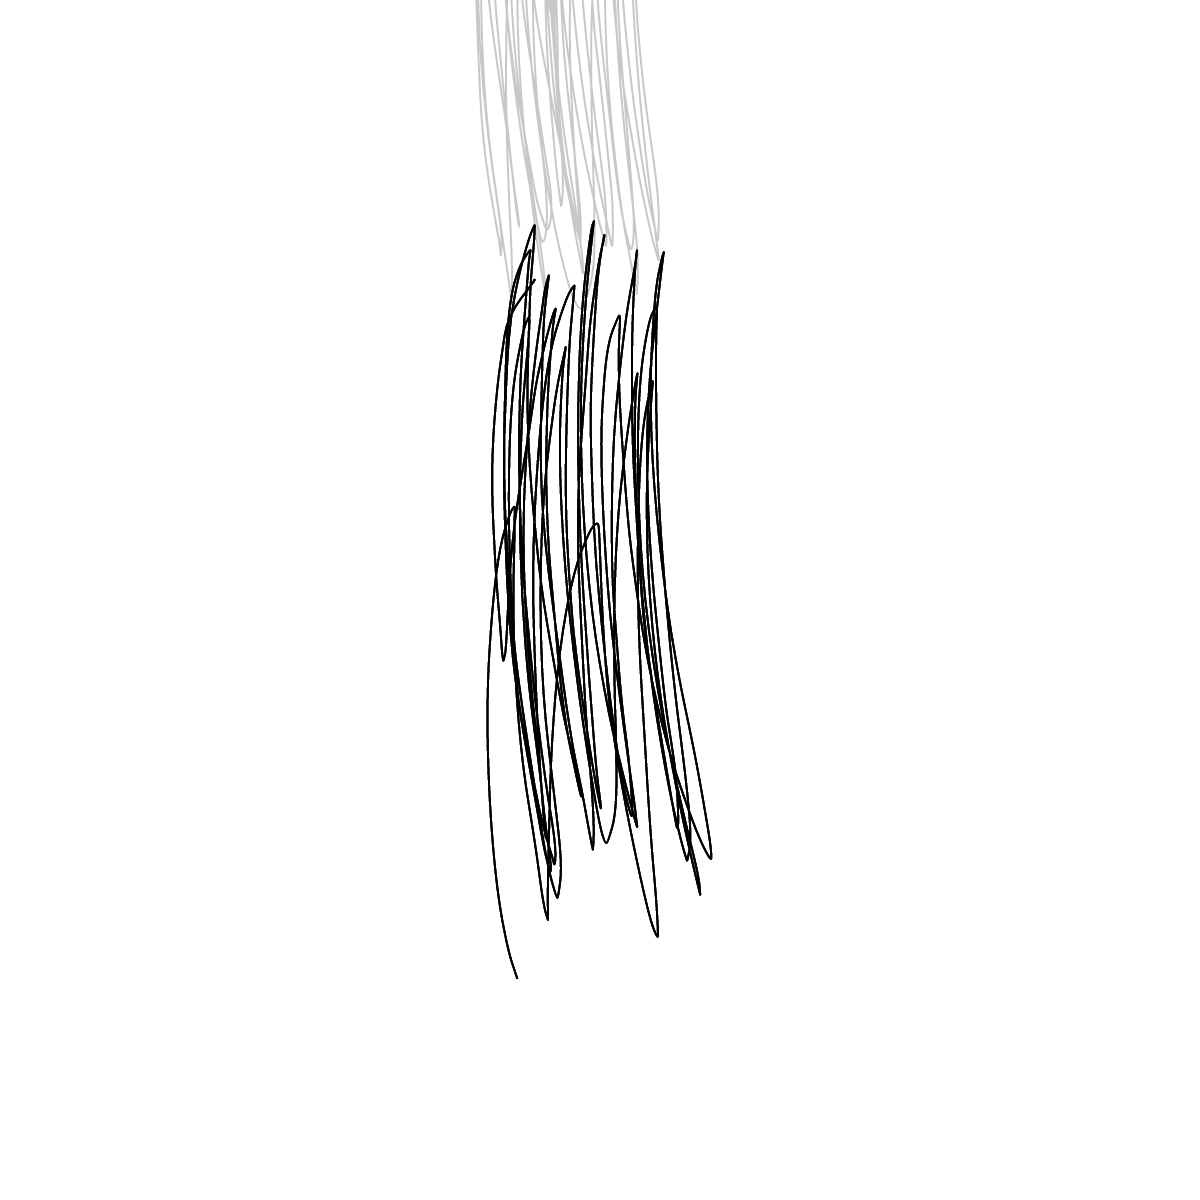 BAAAM drawing#23544 lat:65.0164871215820300lng: -158.3015747070312500